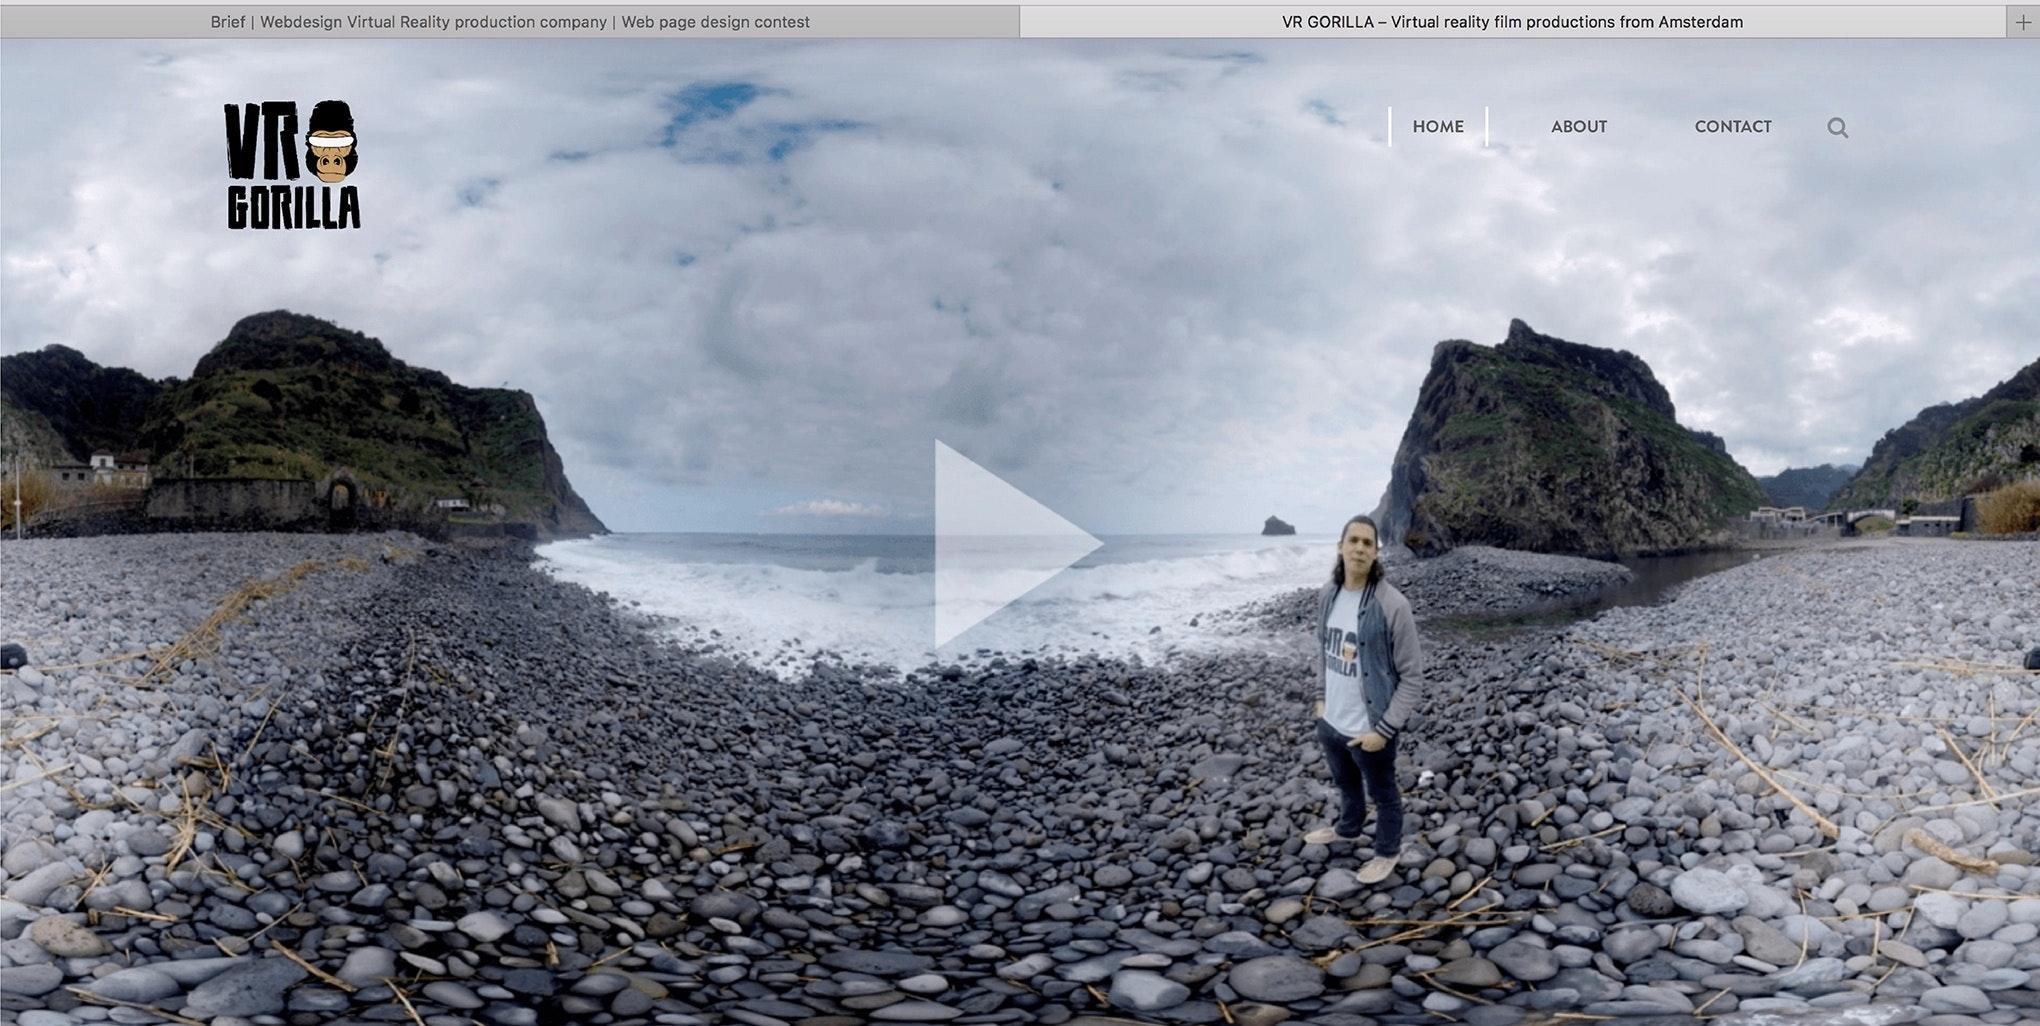 VR Gorilla web design